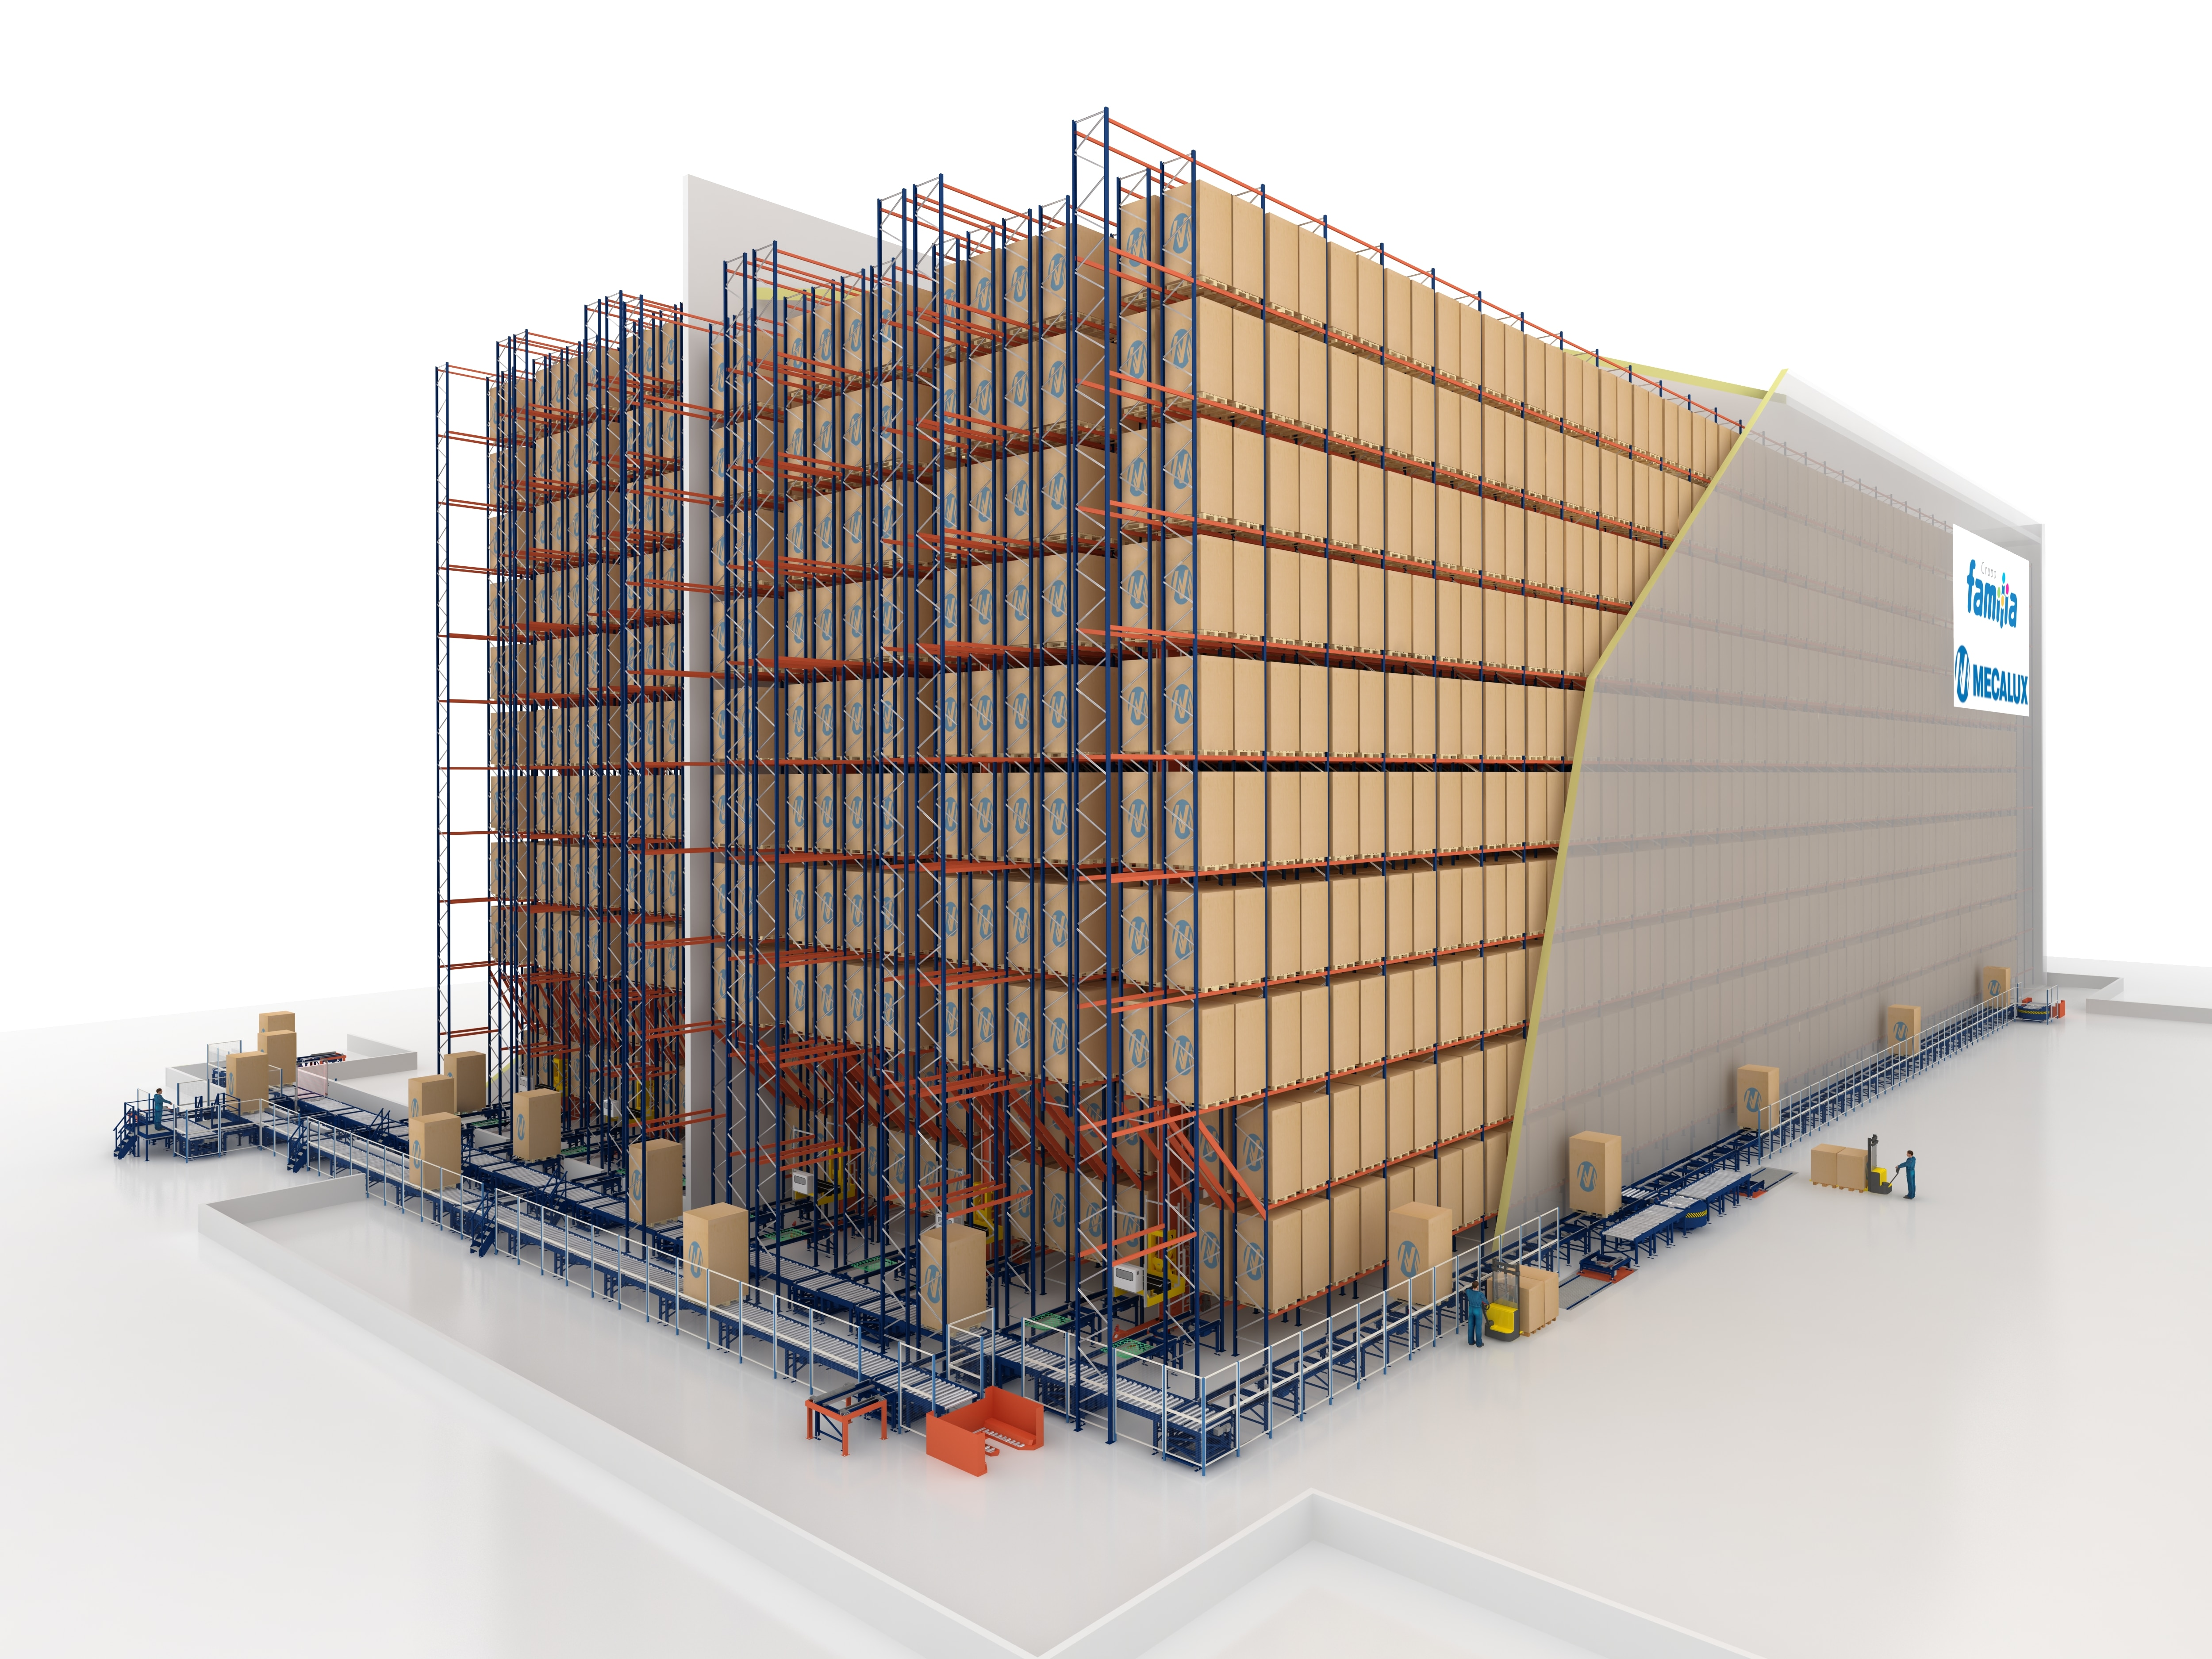 Grupo Familia: Conveyor system for pallets